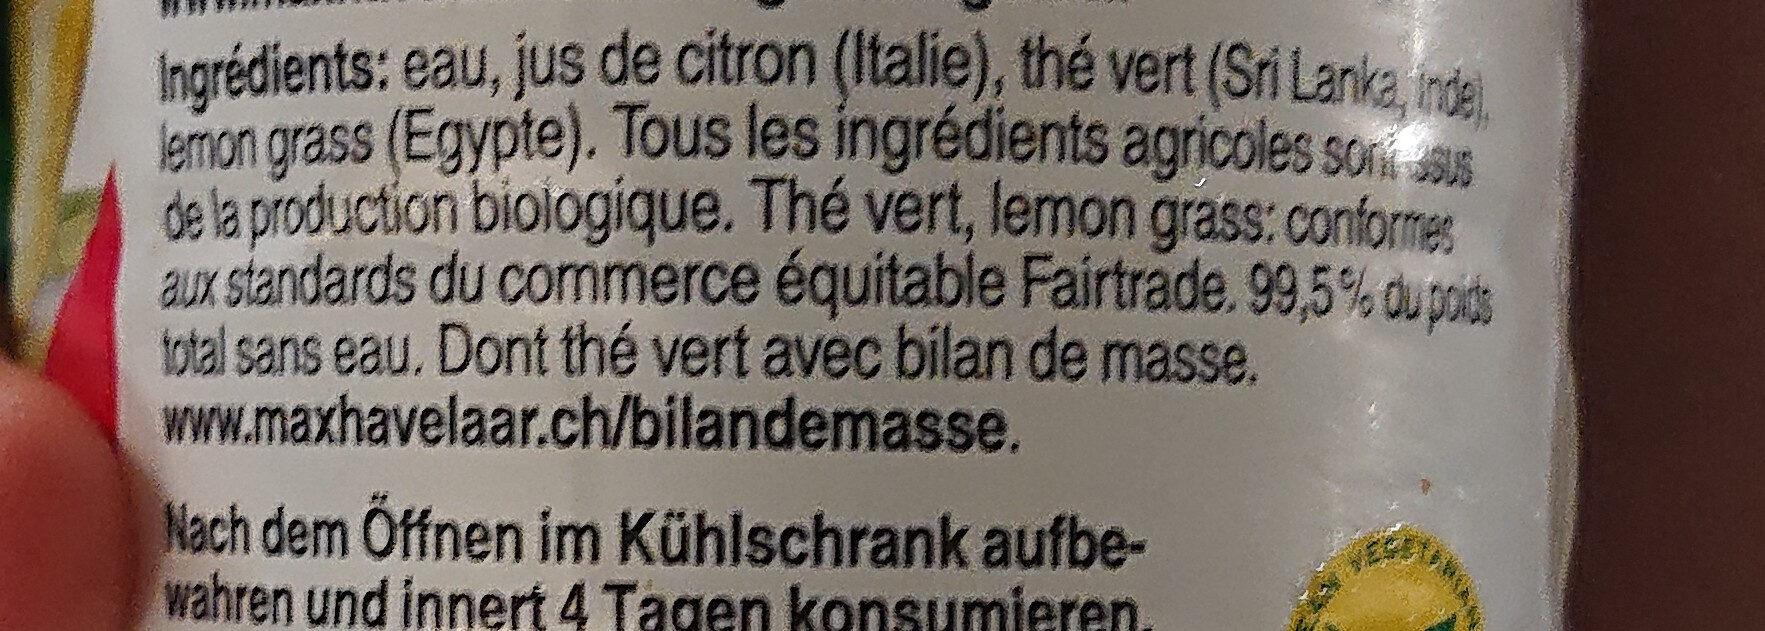 Unsweettened lemongrass green tea - Ingredients - fr